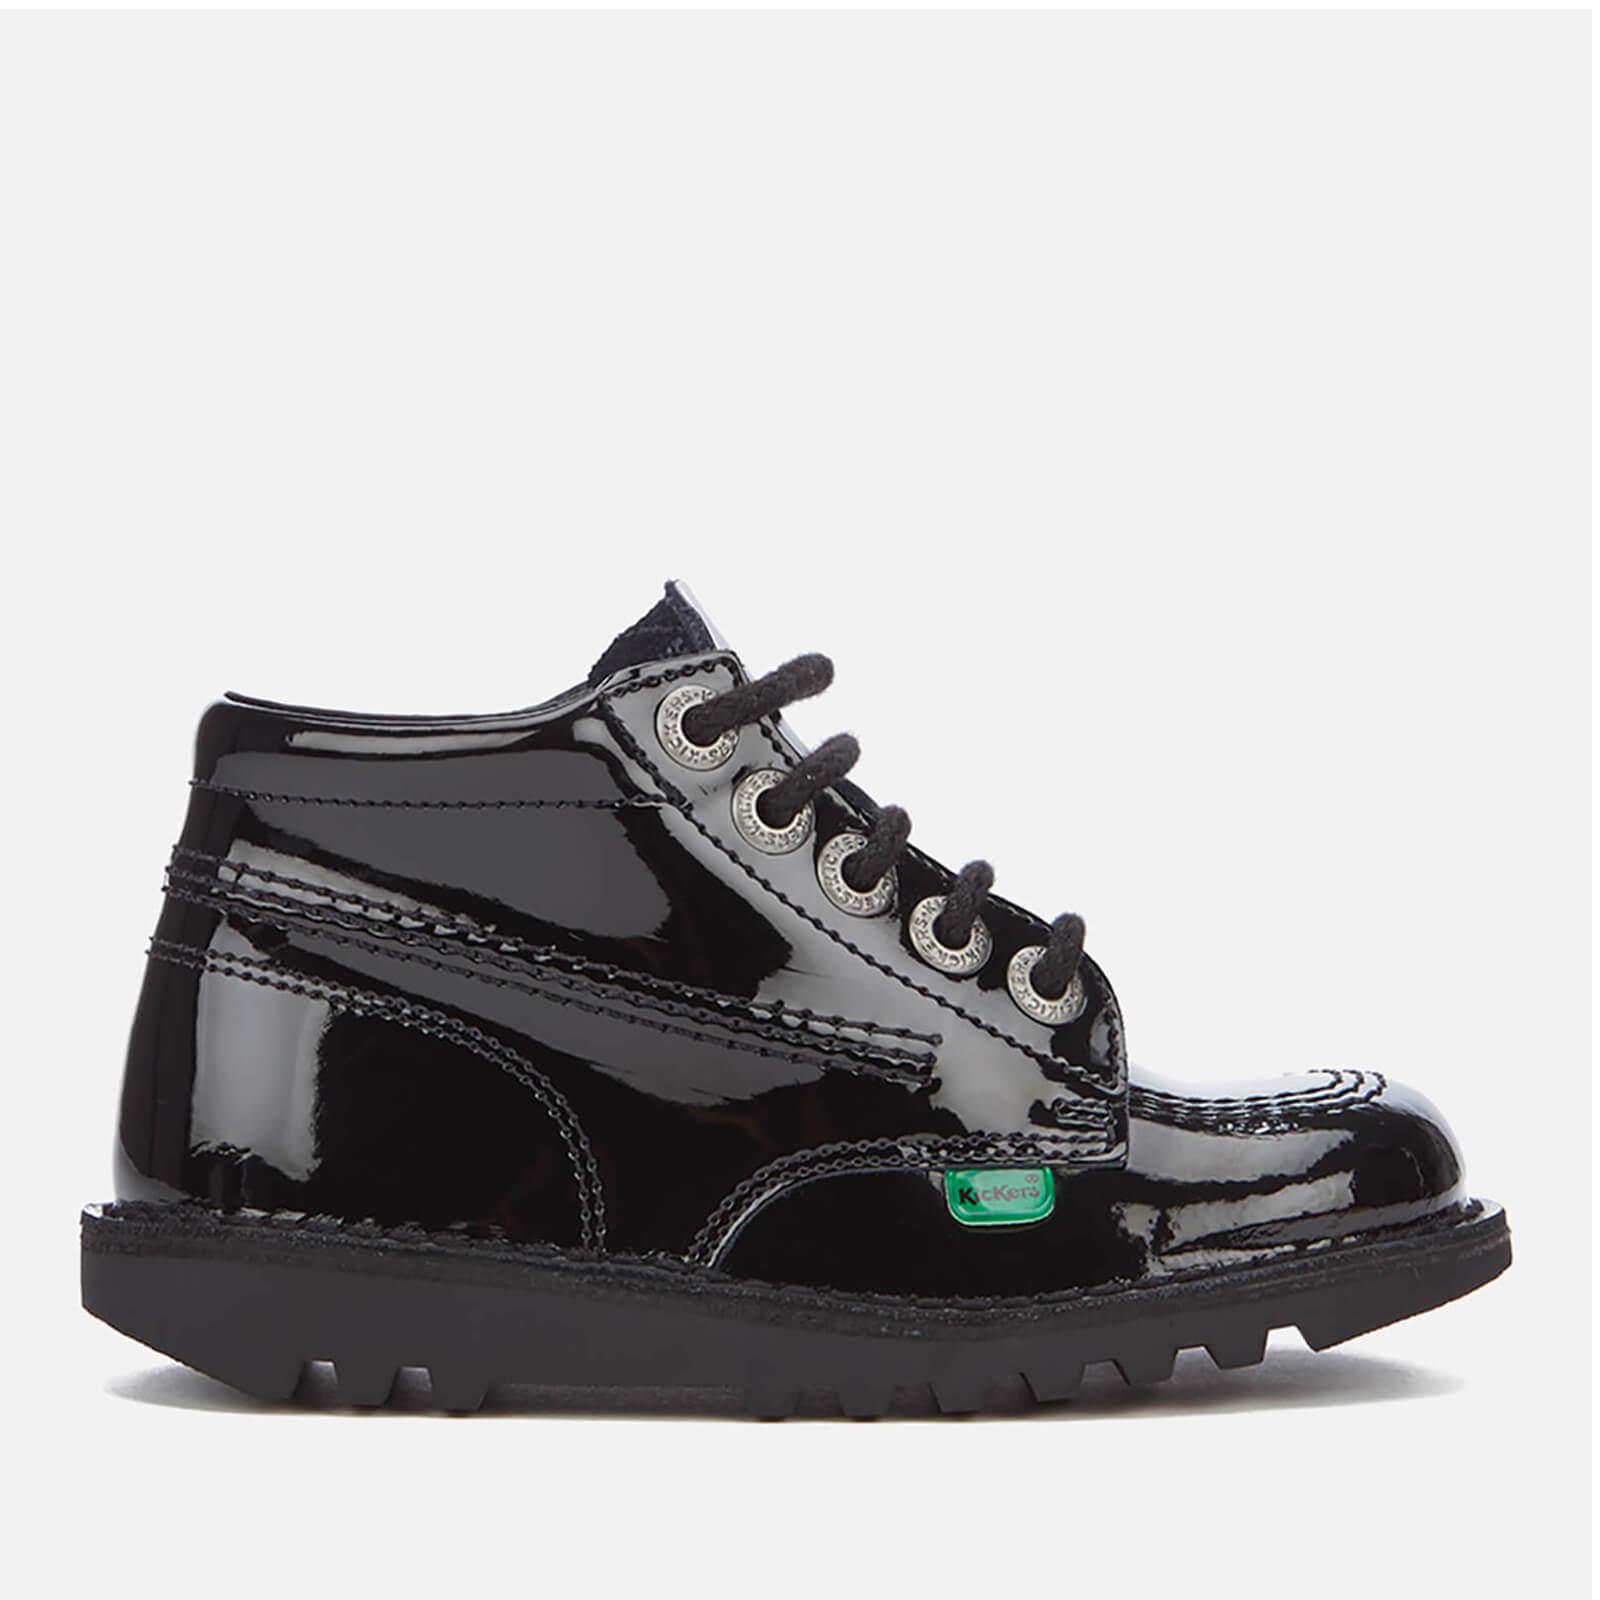 Enfant Hi Chaussures Noir zavvi Kick Kickers Junior ClothingFr c1KJTuF35l